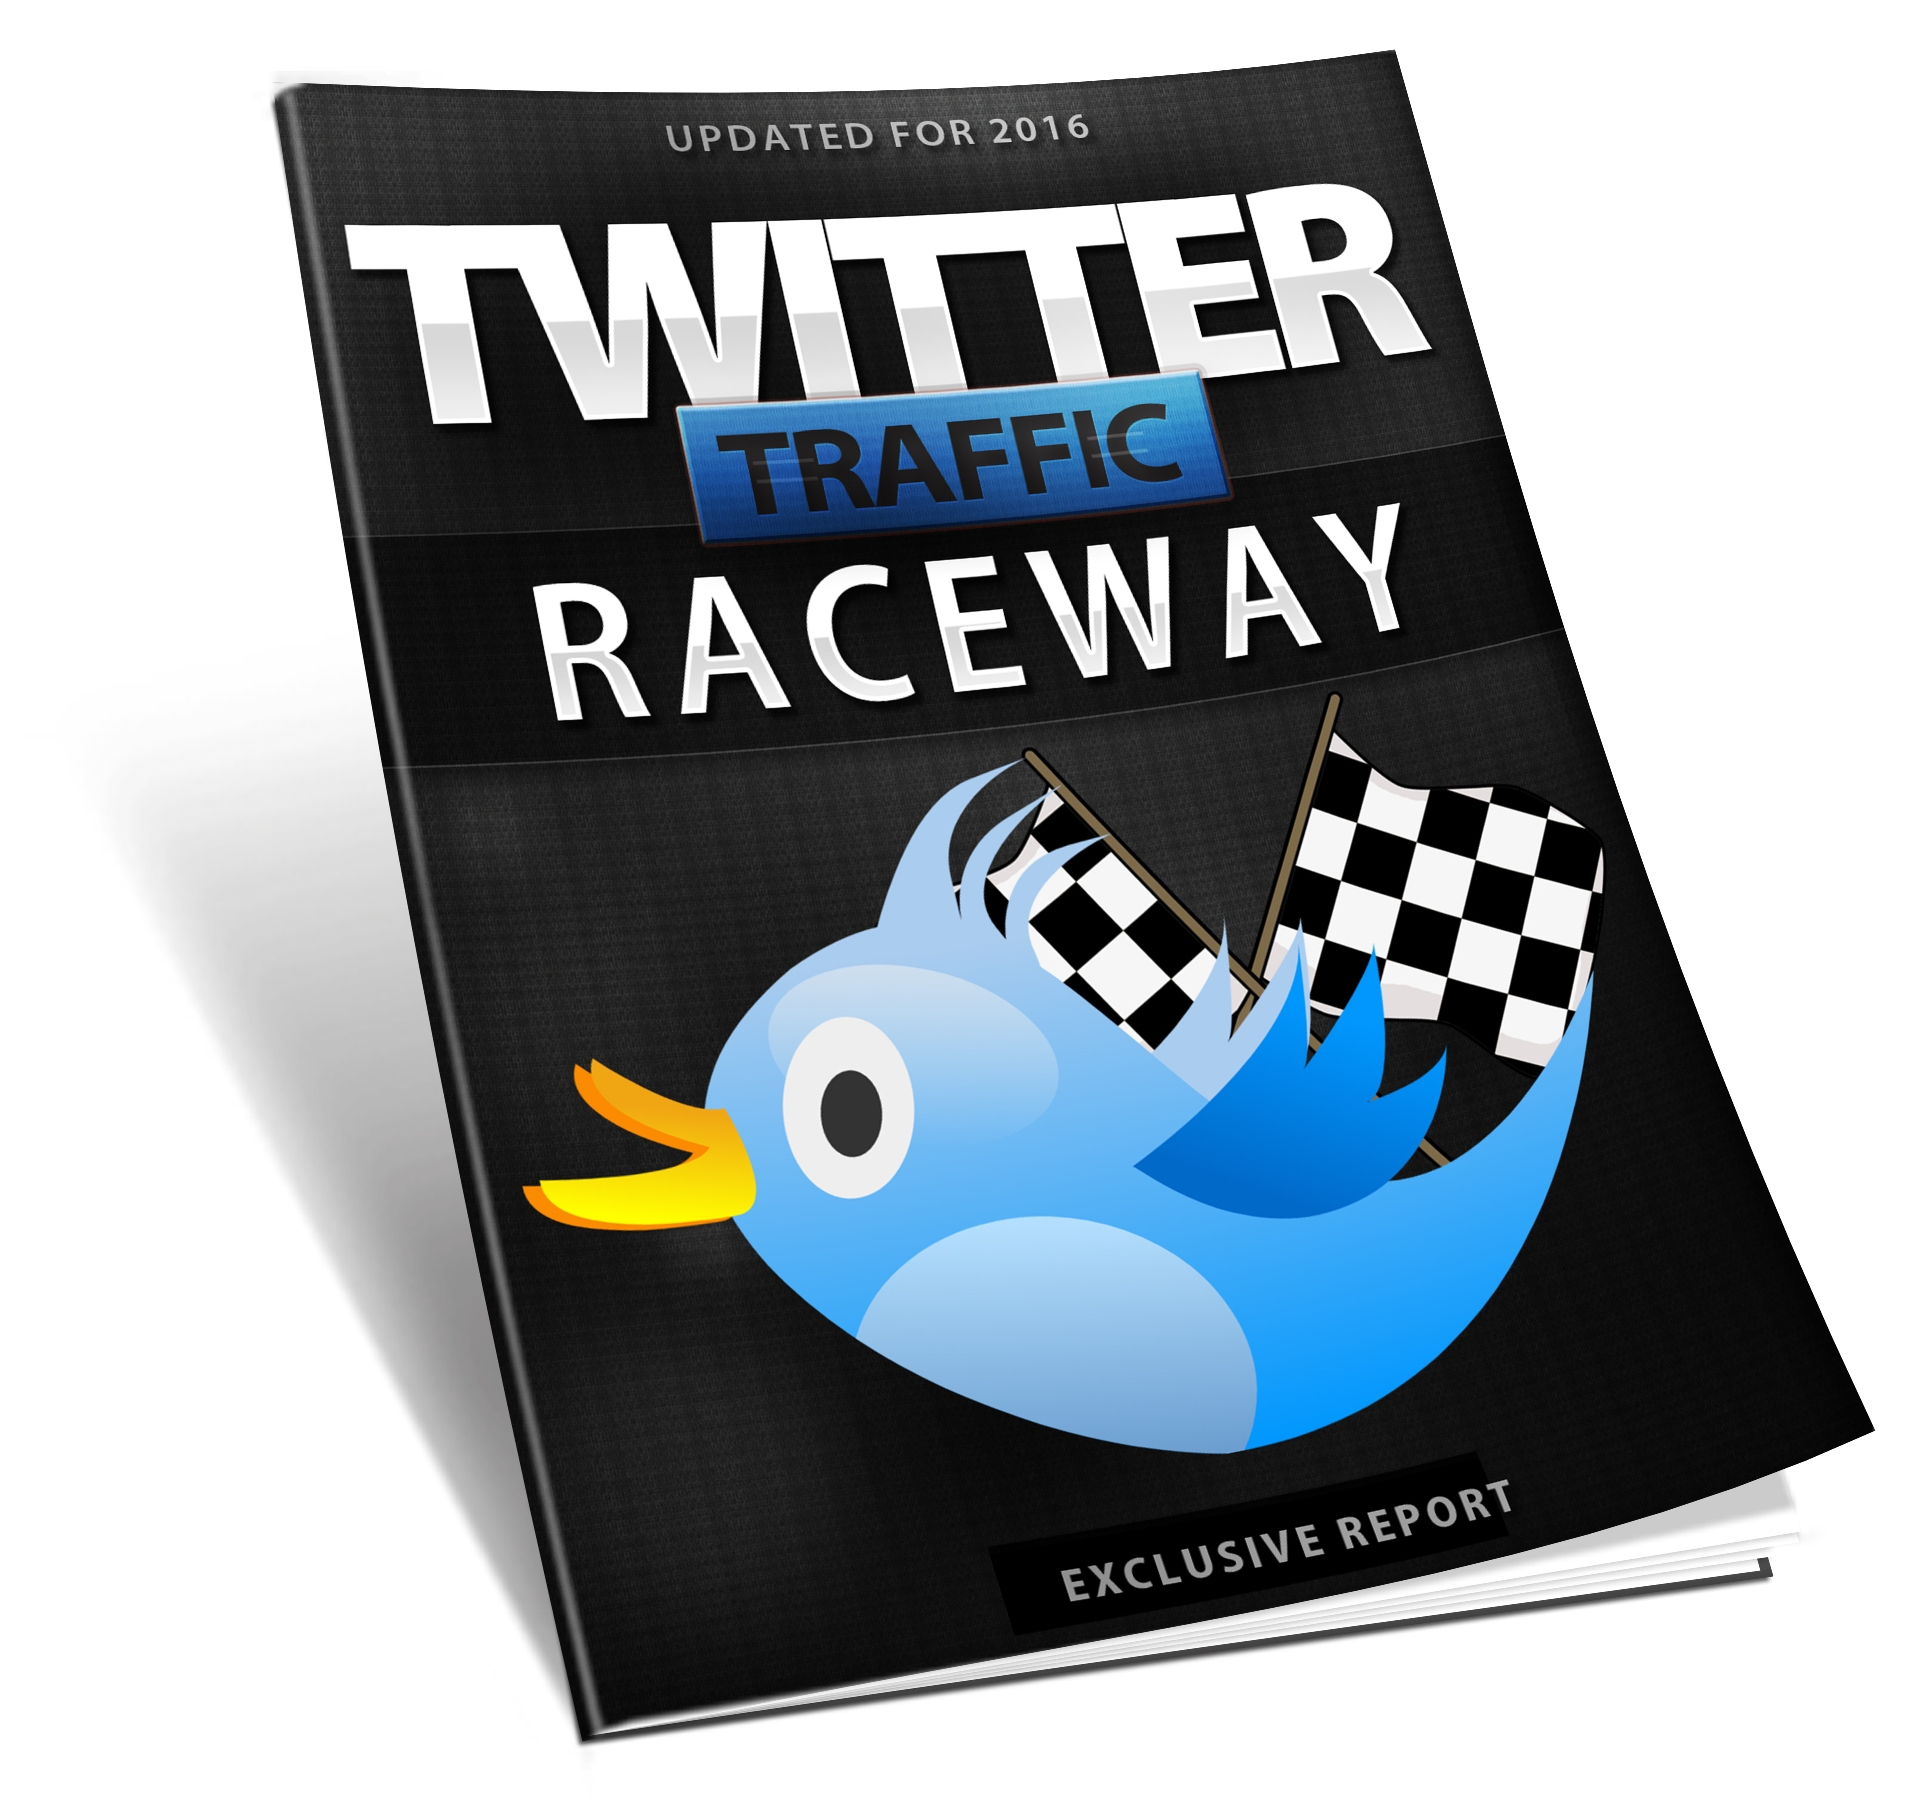 MRR Twitter Traffic Raceway